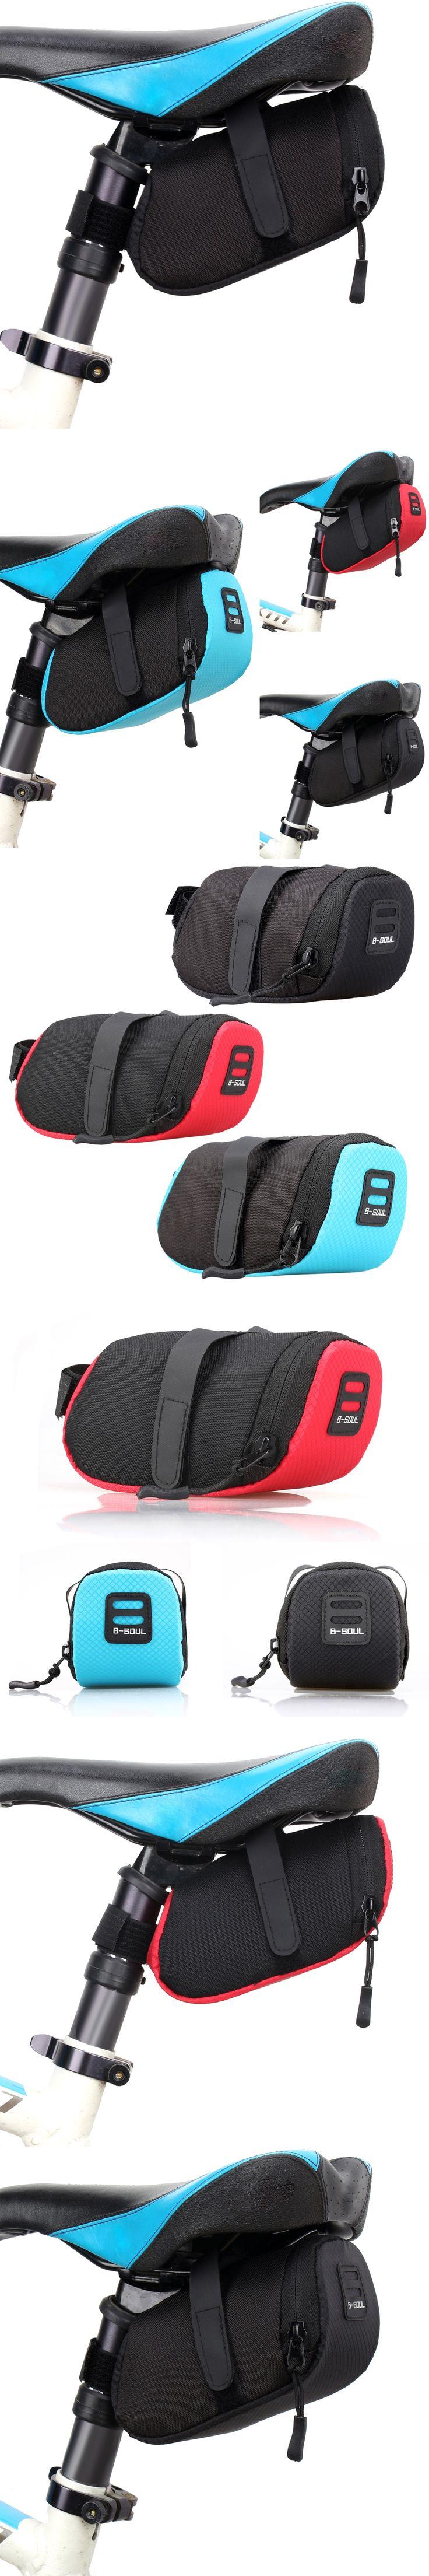 Bicycle Bike Rear Top Tube Bag Waterproof MTB Mountain/Road Bike Rear Bag Bicycle Saddle Bag Cycling Rear Seat Tail Bag Hot Sale